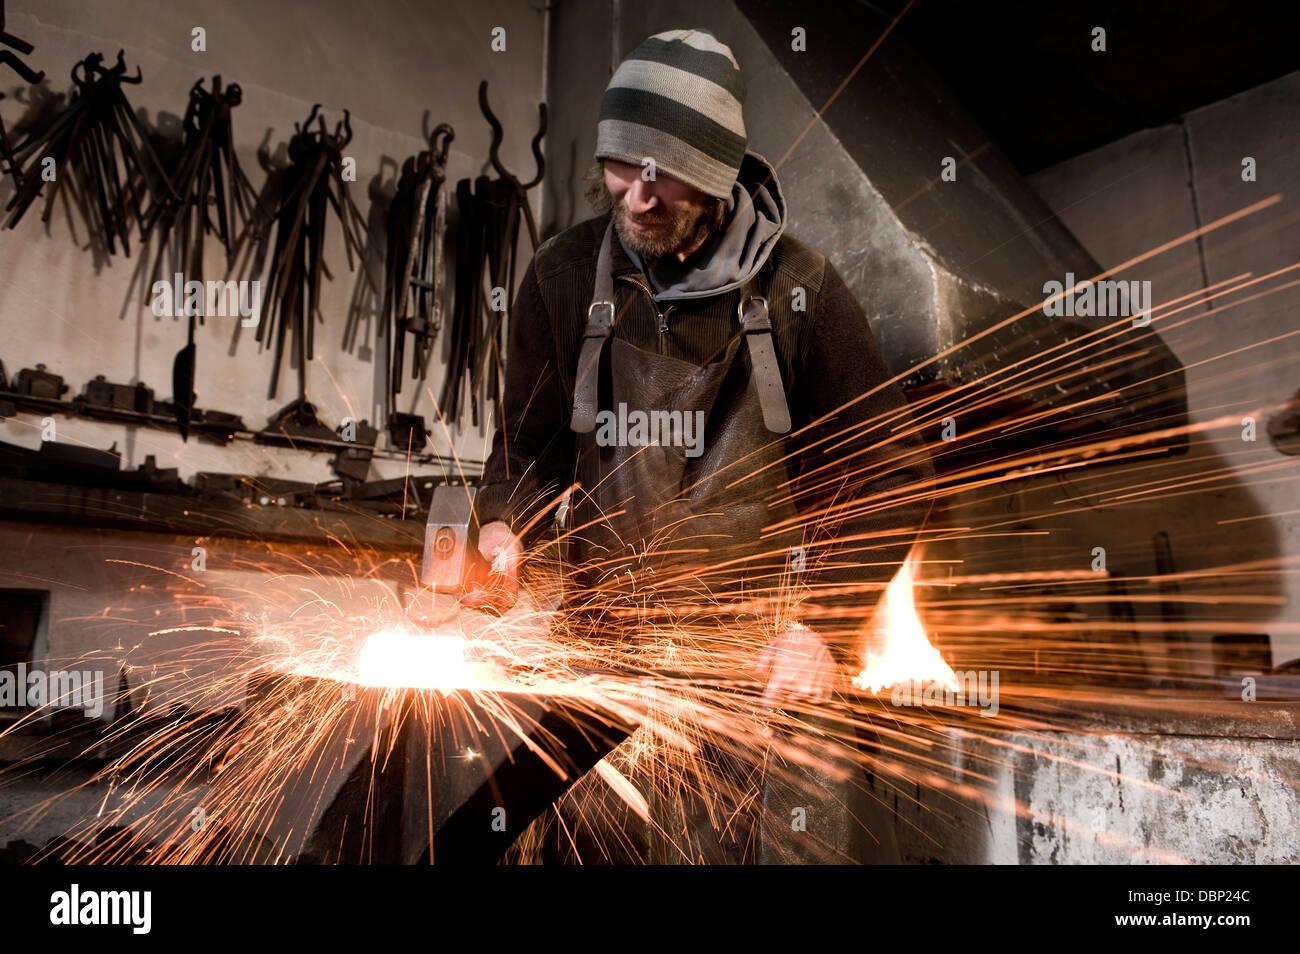 Blacksmith hammering metal on an anvil, Landshut, Bavaria, Germany - Stock Image